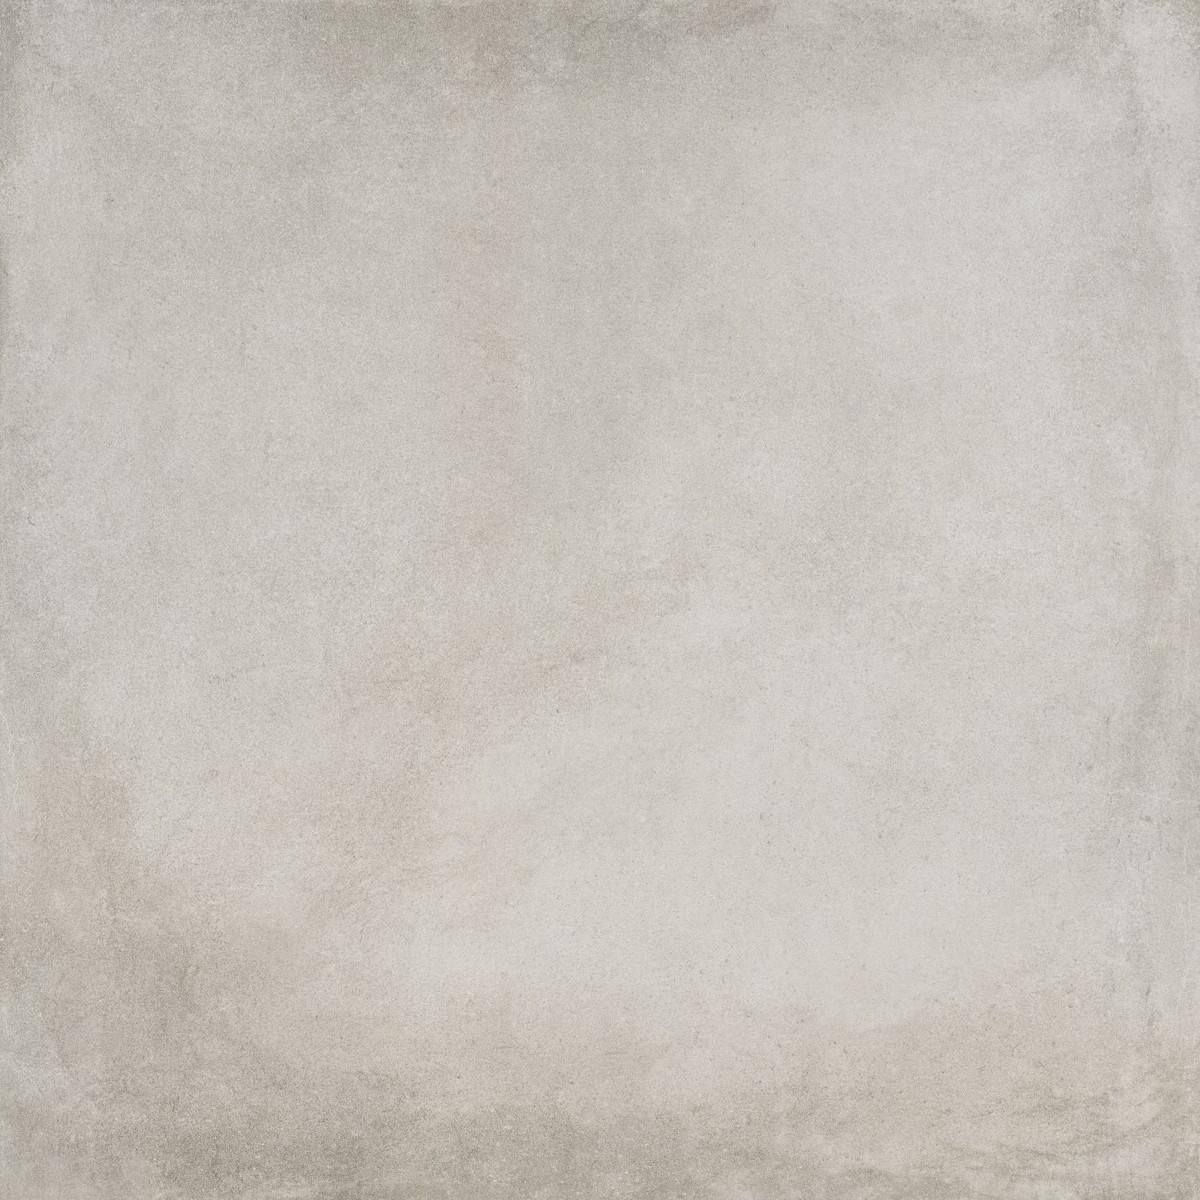 Bodenfliese Gazzini Essential sand 60 x 60 cm – Bild 2